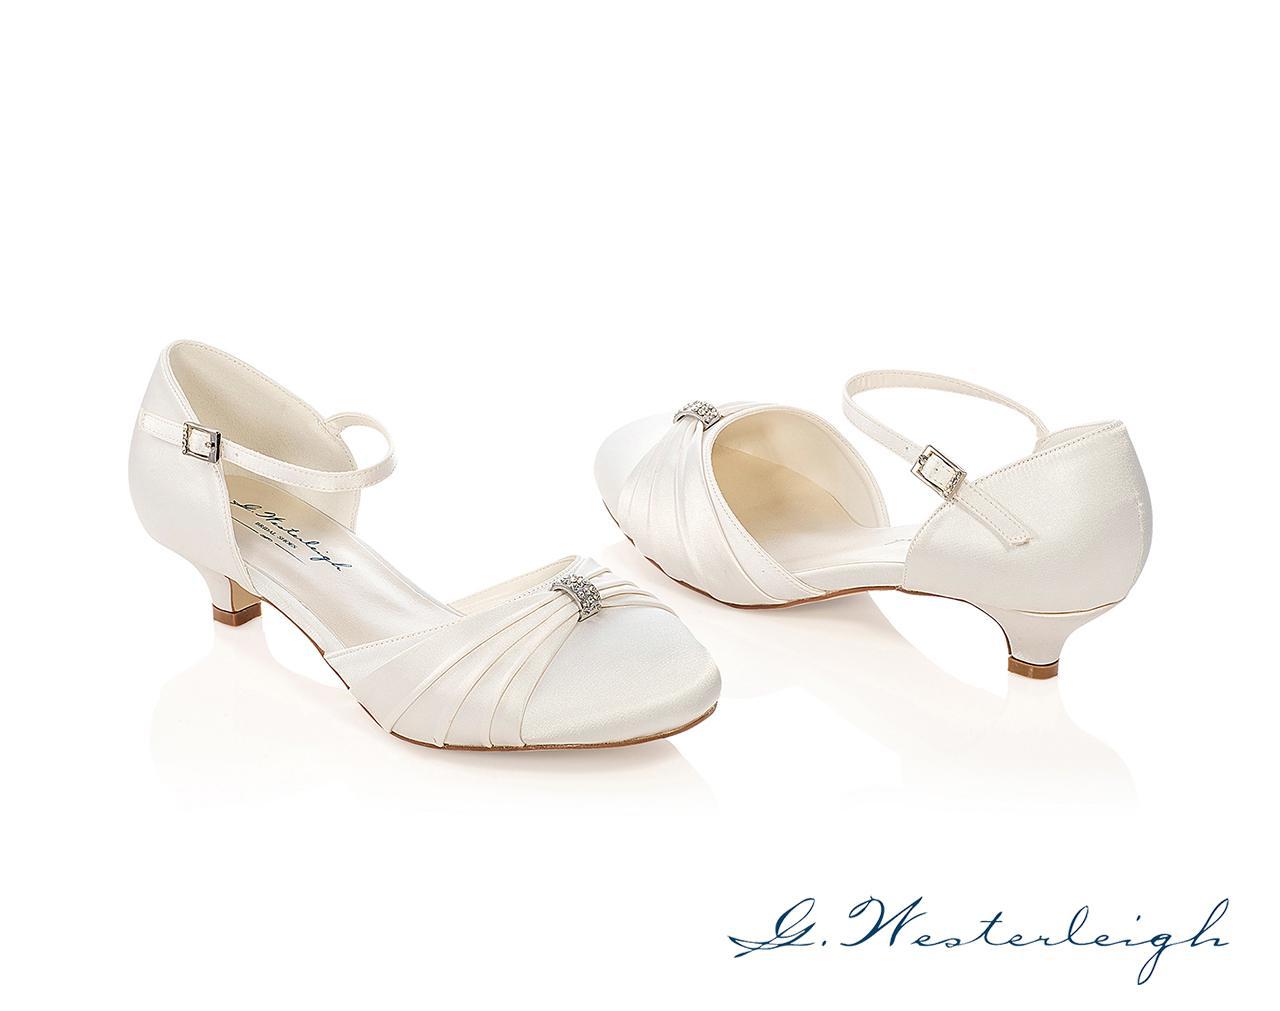 HEIDI - Westerleigh cipő. 25.500 Ft. 3 cm sarok